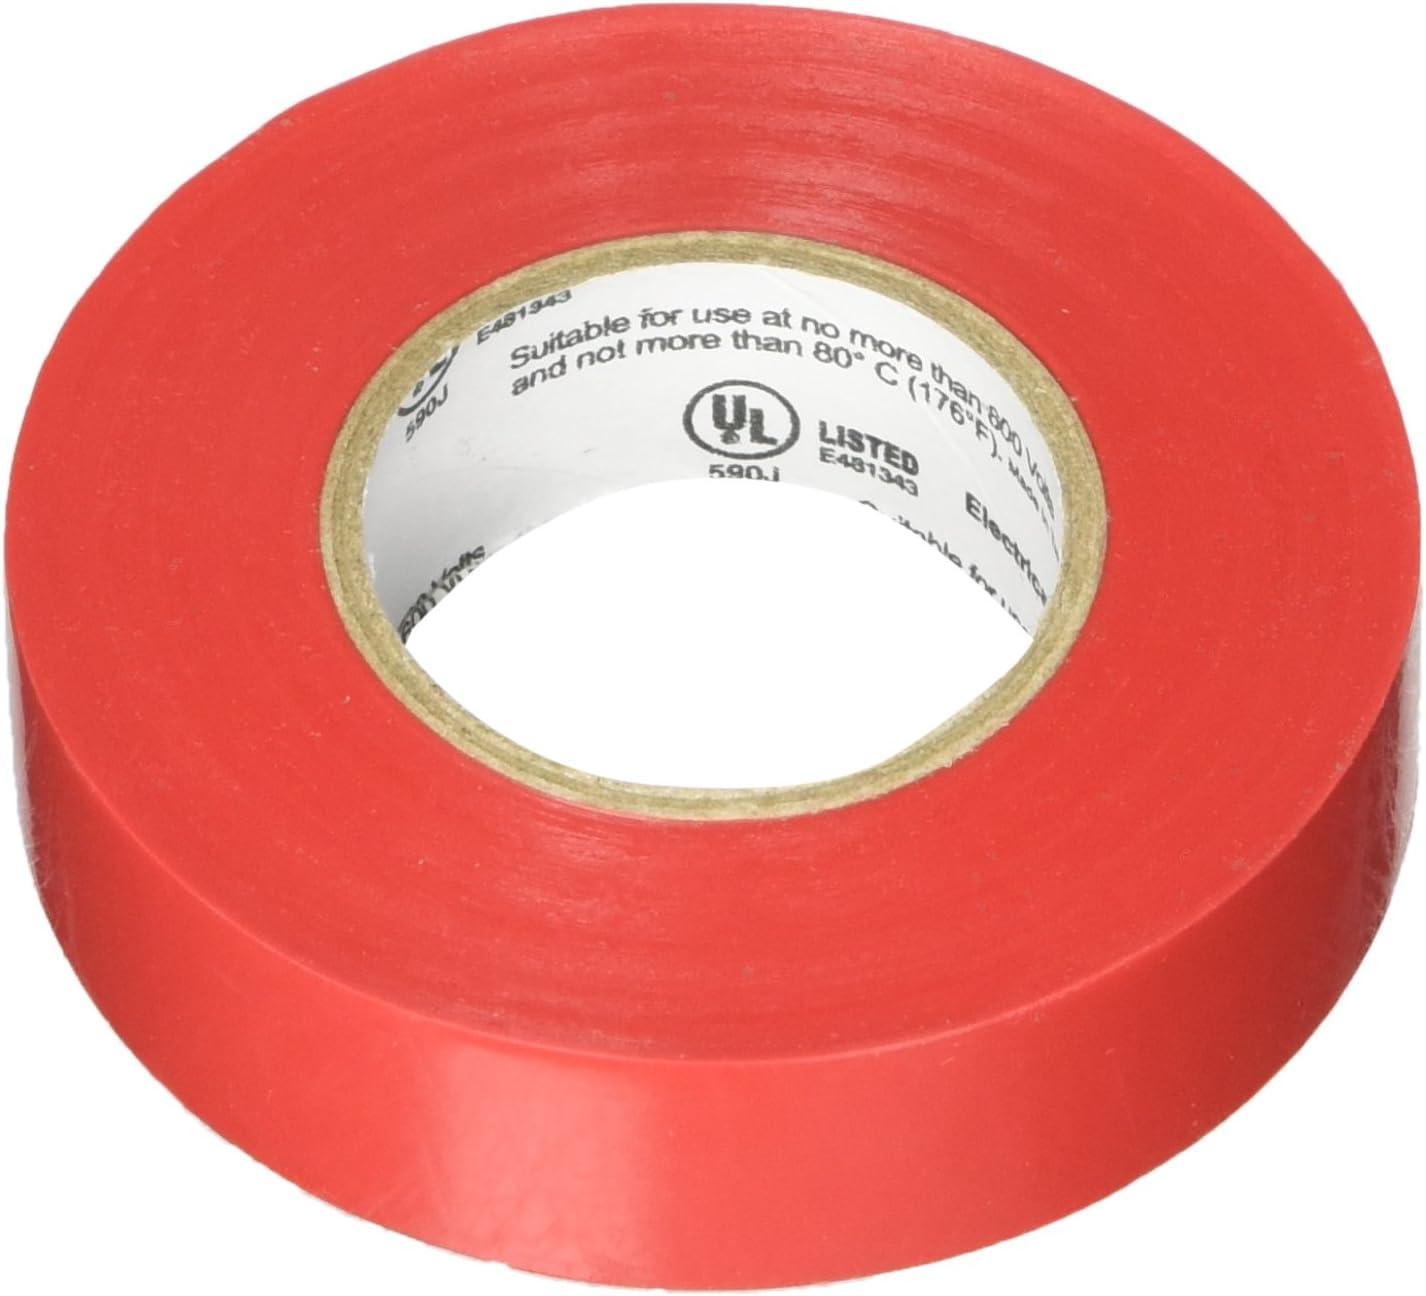 PVC 7mil Protak Color Electrical Tape 3//4 width x 60 length Black 1 Roll